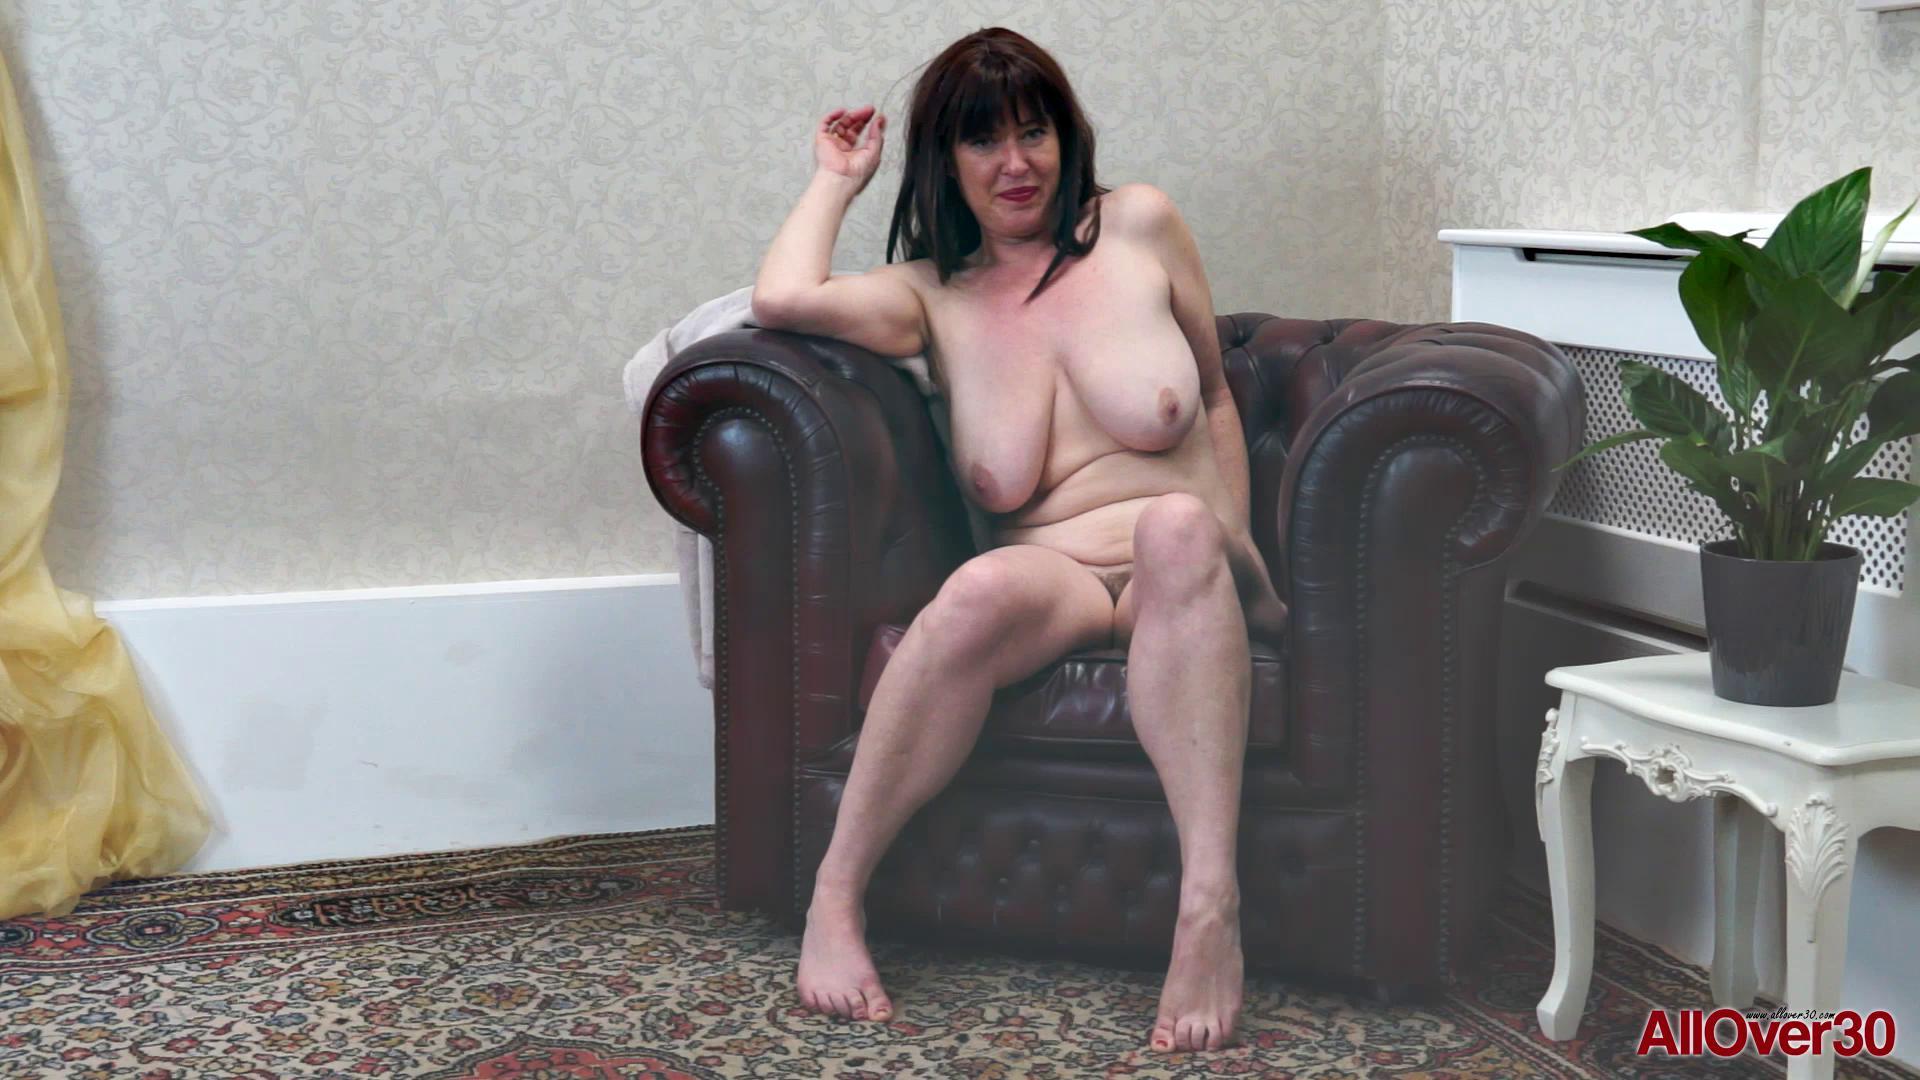 AllOver30 – Janey